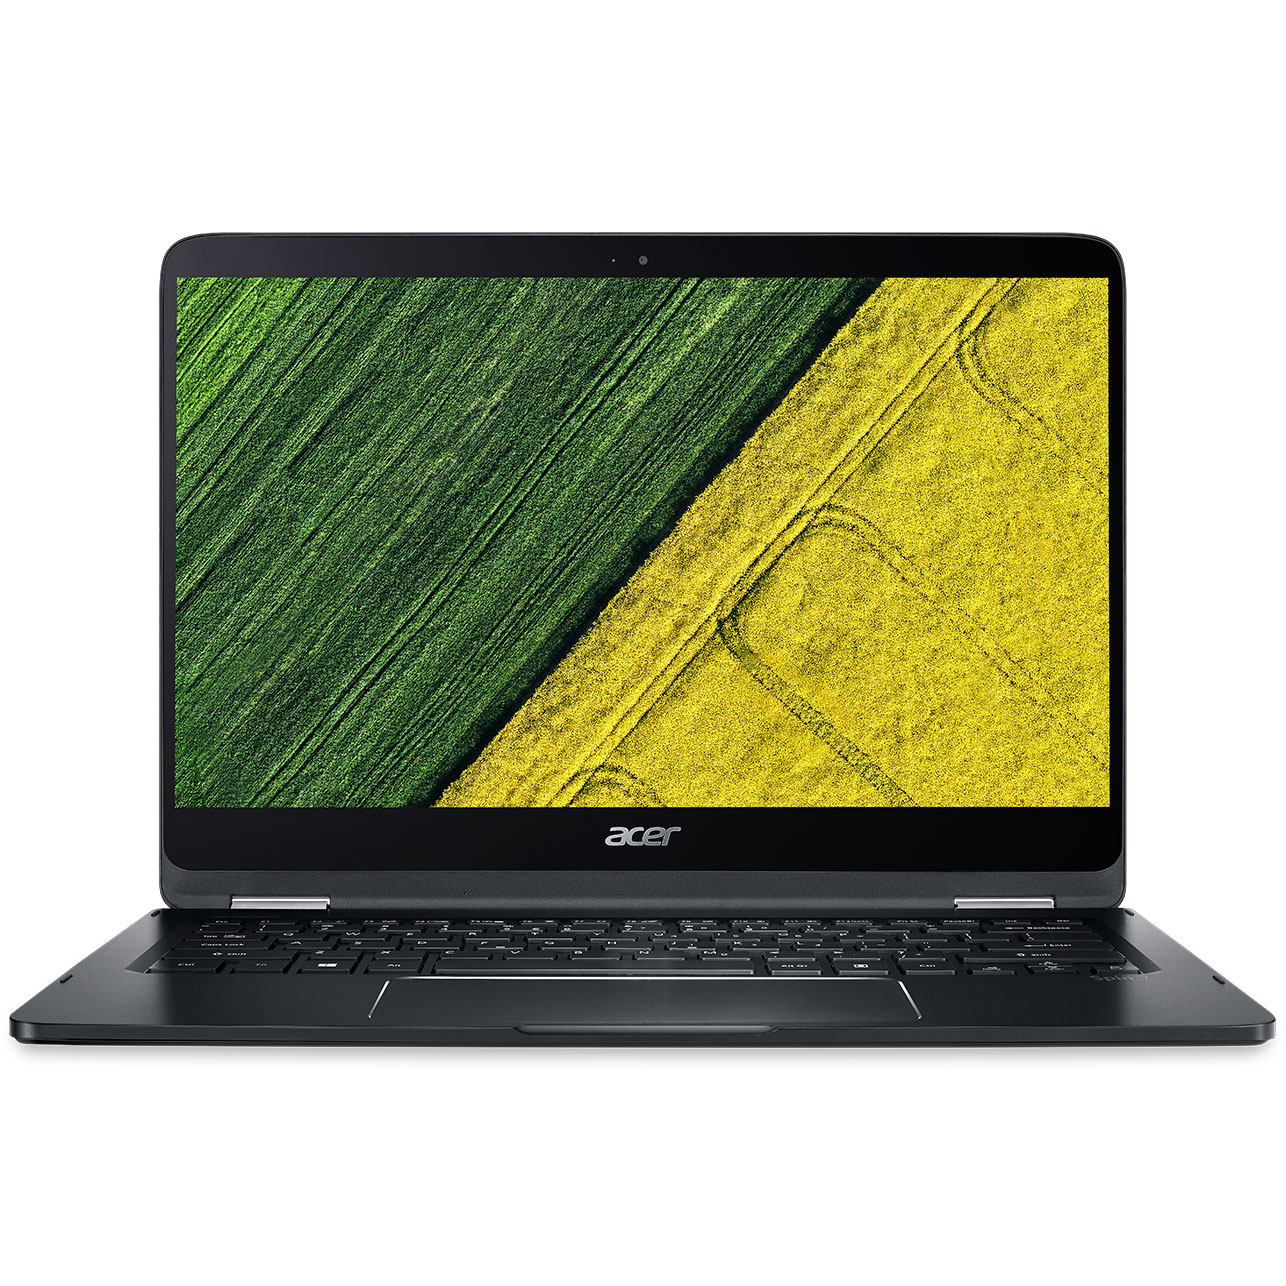 Acer Spin SP714-51 Intel Bluetooth 64 Bit